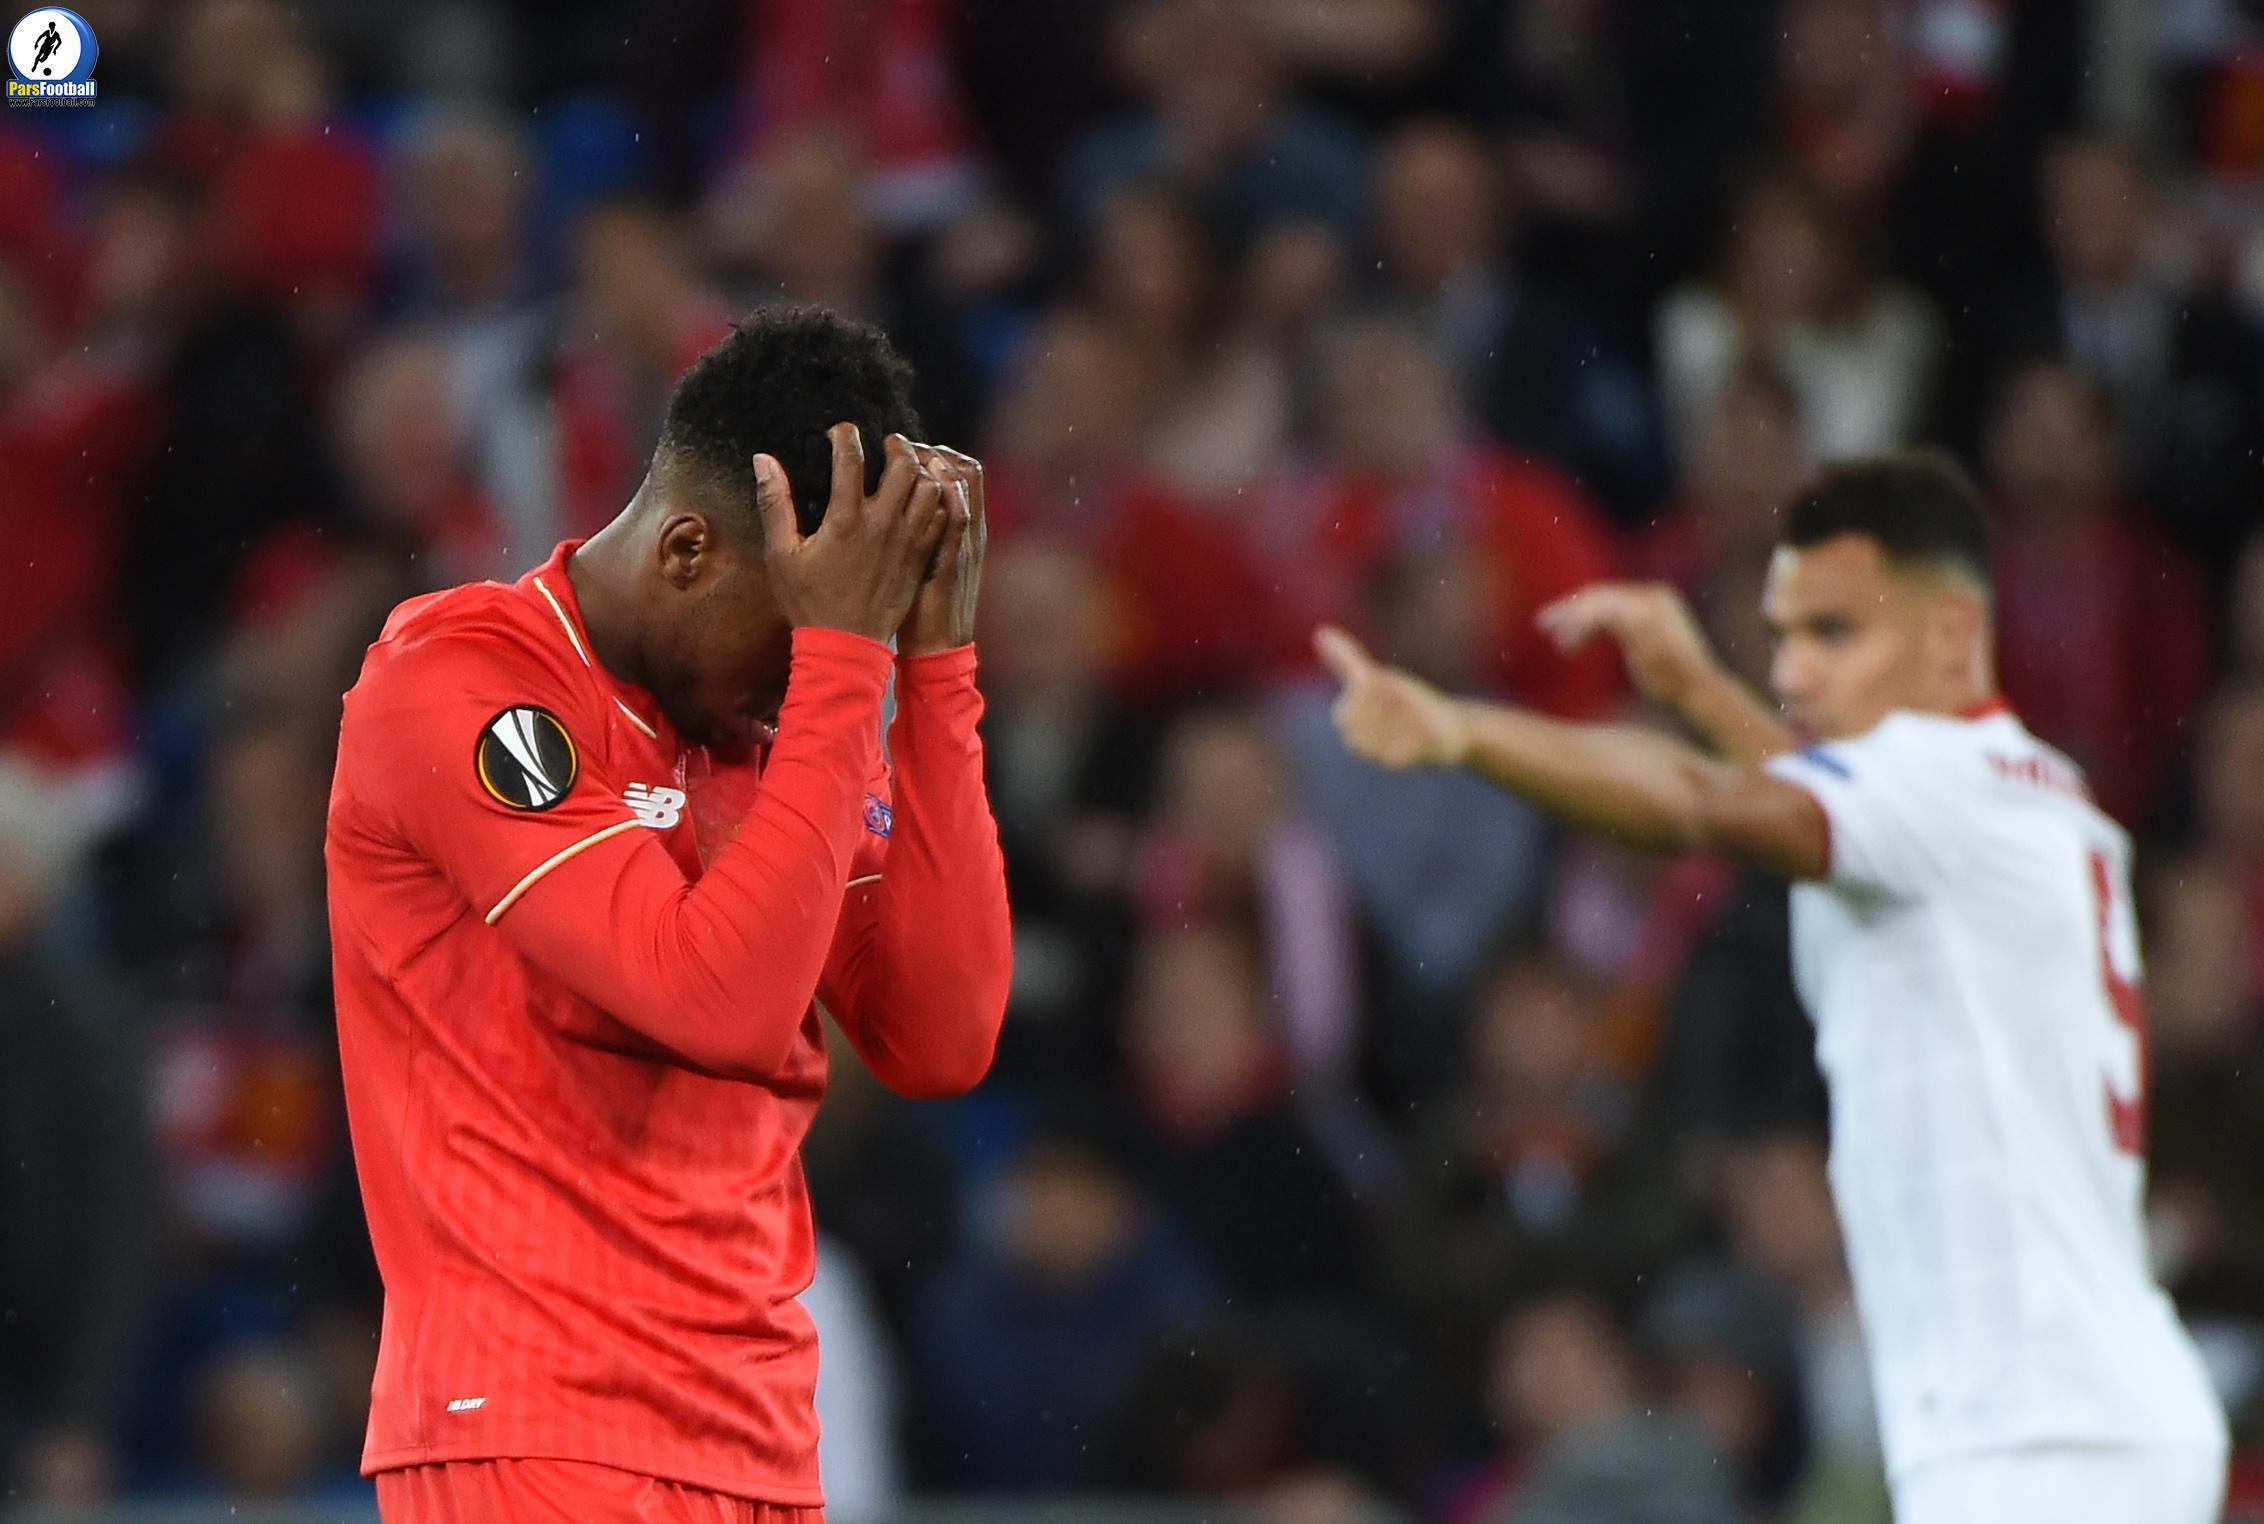 Liverpool's English forward Daniel Sturridge reacts after losing  the UEFA Europa League final football match between Liverpool FC and Sevilla FC at the St Jakob-Park stadium in Basel, on May 18, 2016.   AFP PHOTO / SEBASTIEN BOZON / AFP / SEBASTIEN BOZON        (Photo credit should read SEBASTIEN BOZON/AFP/Getty Images)